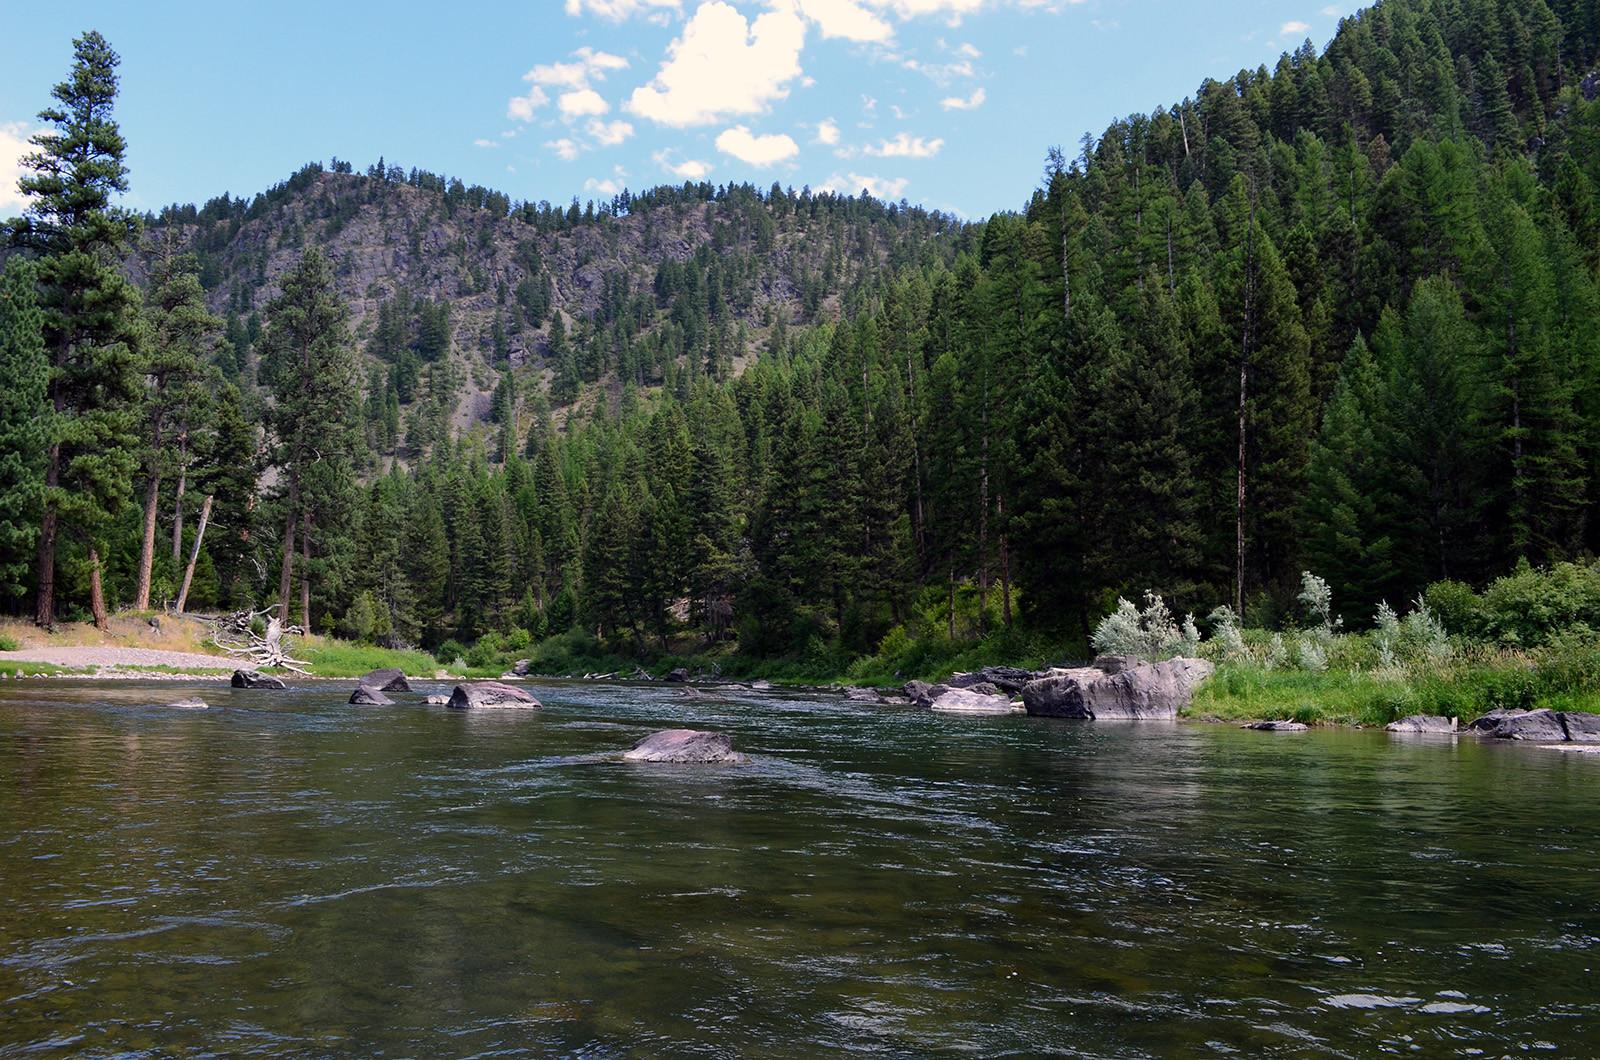 Wapiti Waters Fly Fishing Montana With Jack C. Mauer: Blackfoot River in western Montana